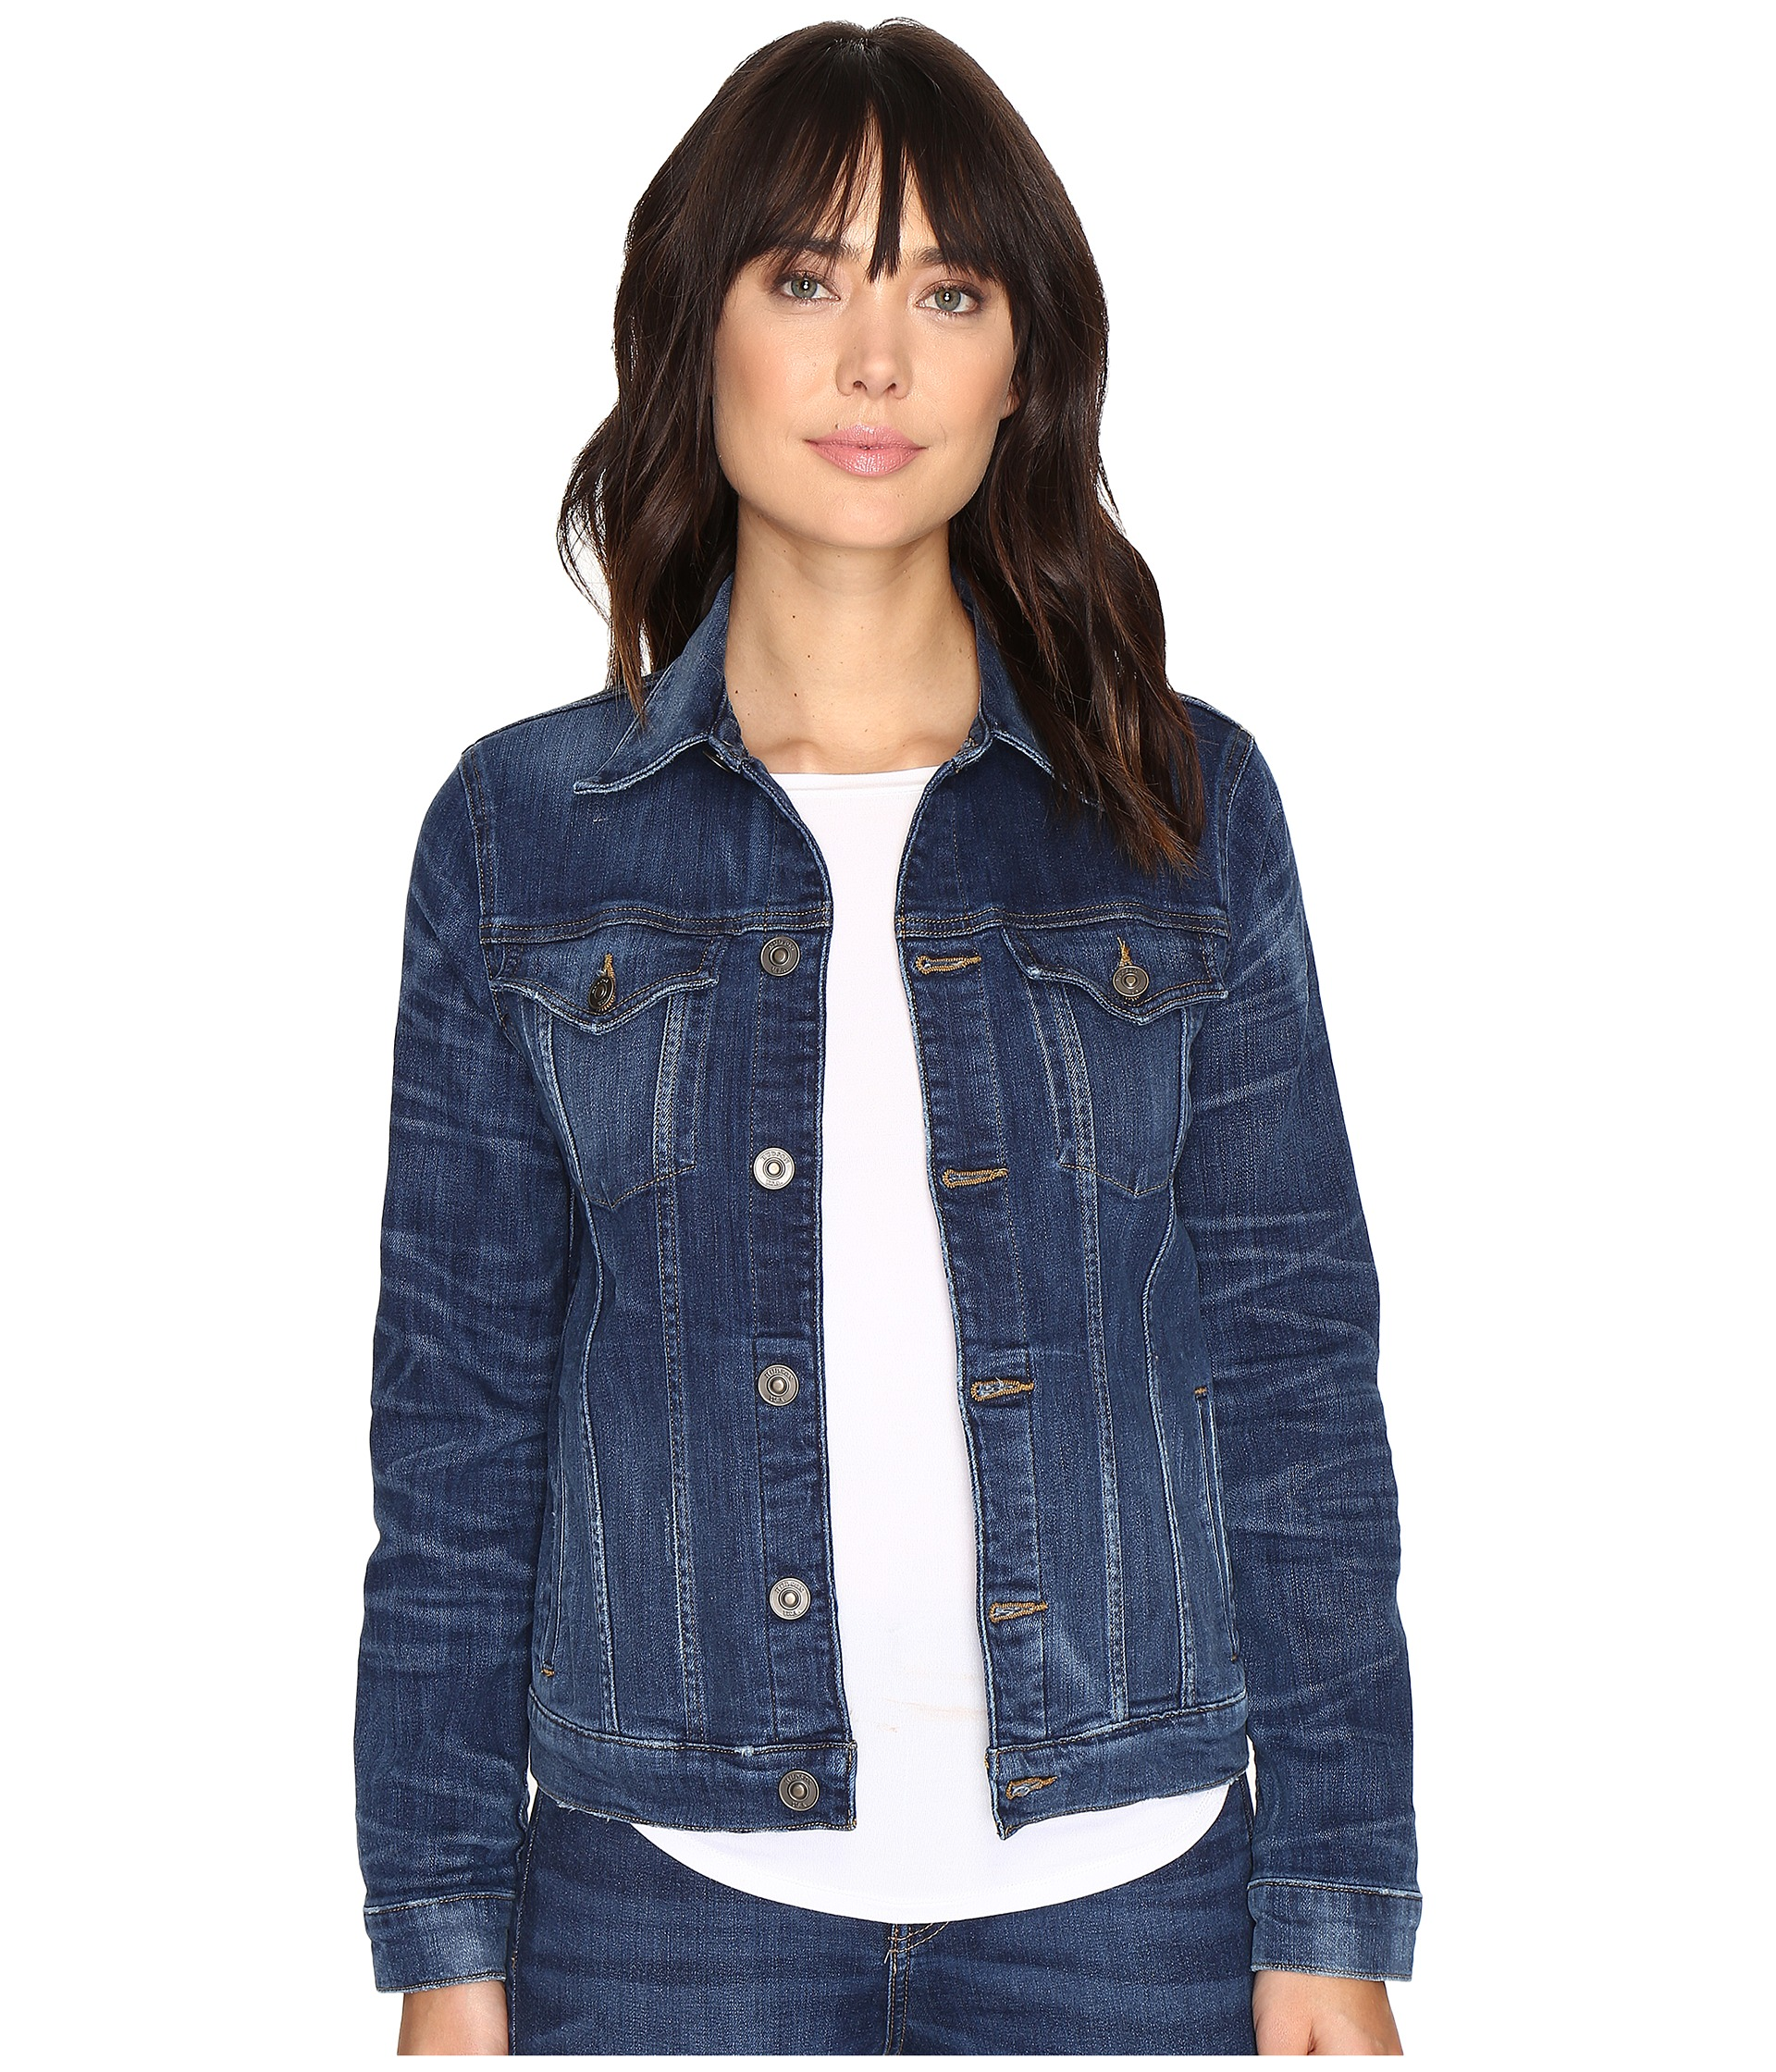 Denim Jackets Clothing | Shipped Free at Zappos